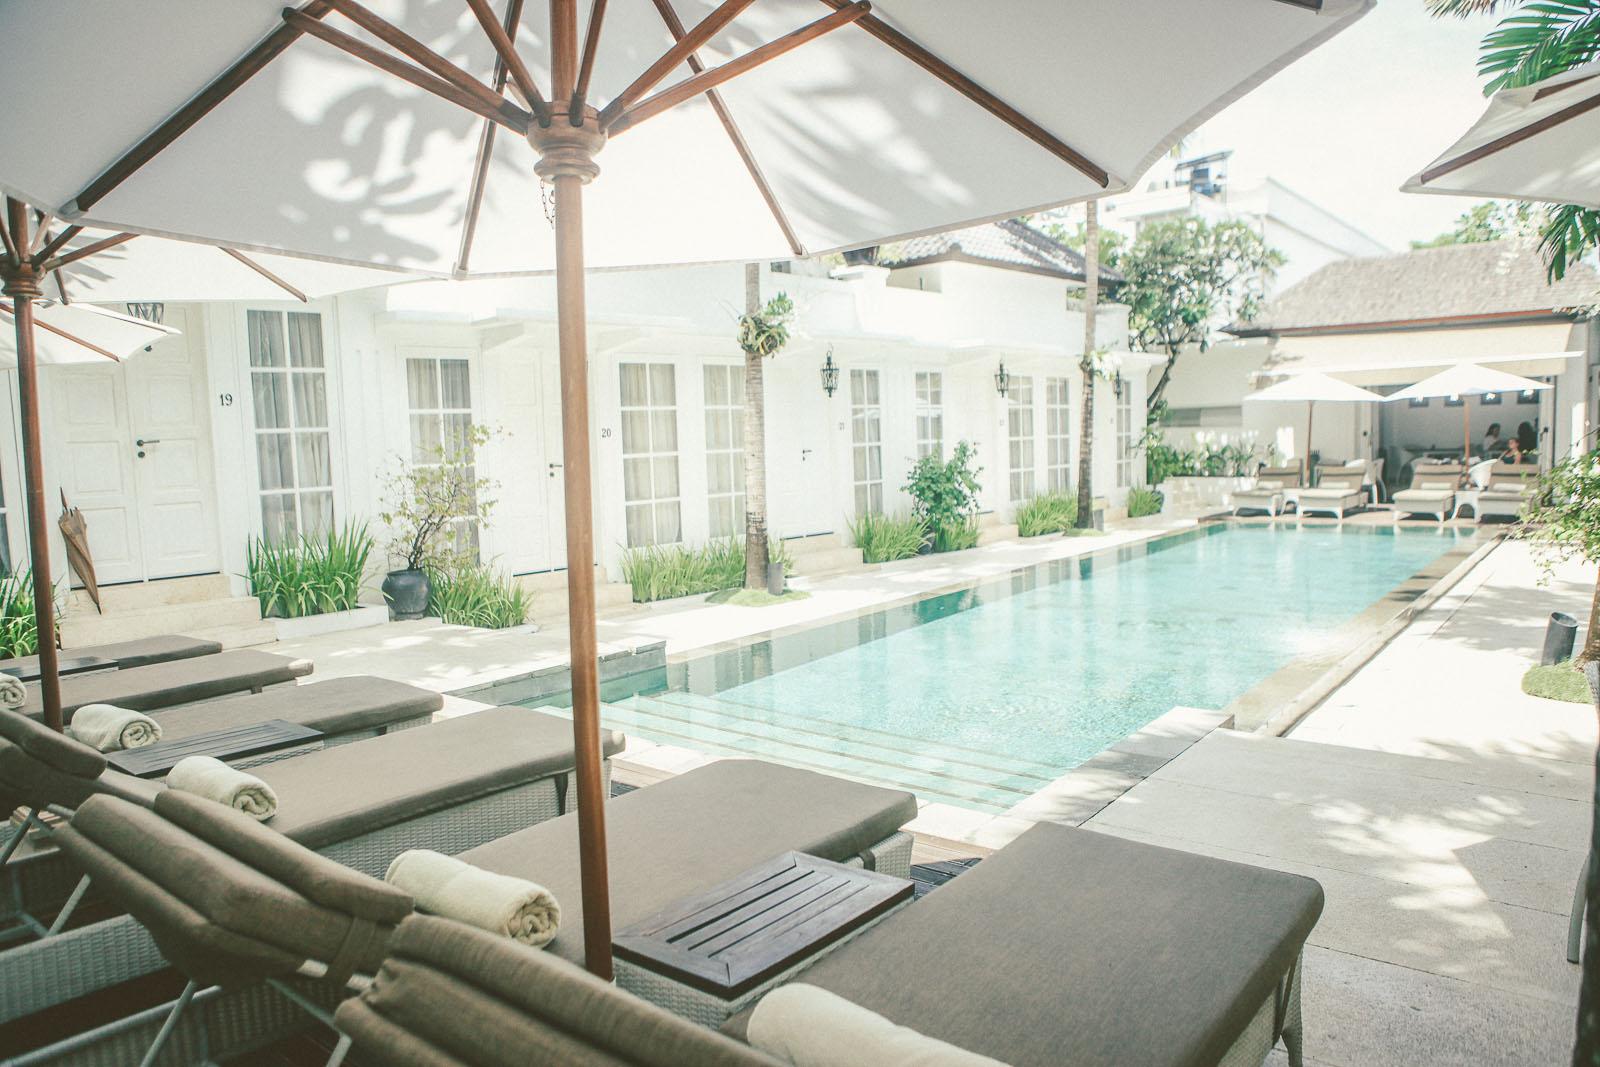 Bali-Travel-Blog-Seminyak-Restaurant-Bar-Breakfast-Surf-Uluwatu-The-Colonial-Hotel-Sea-Circus-2051-2